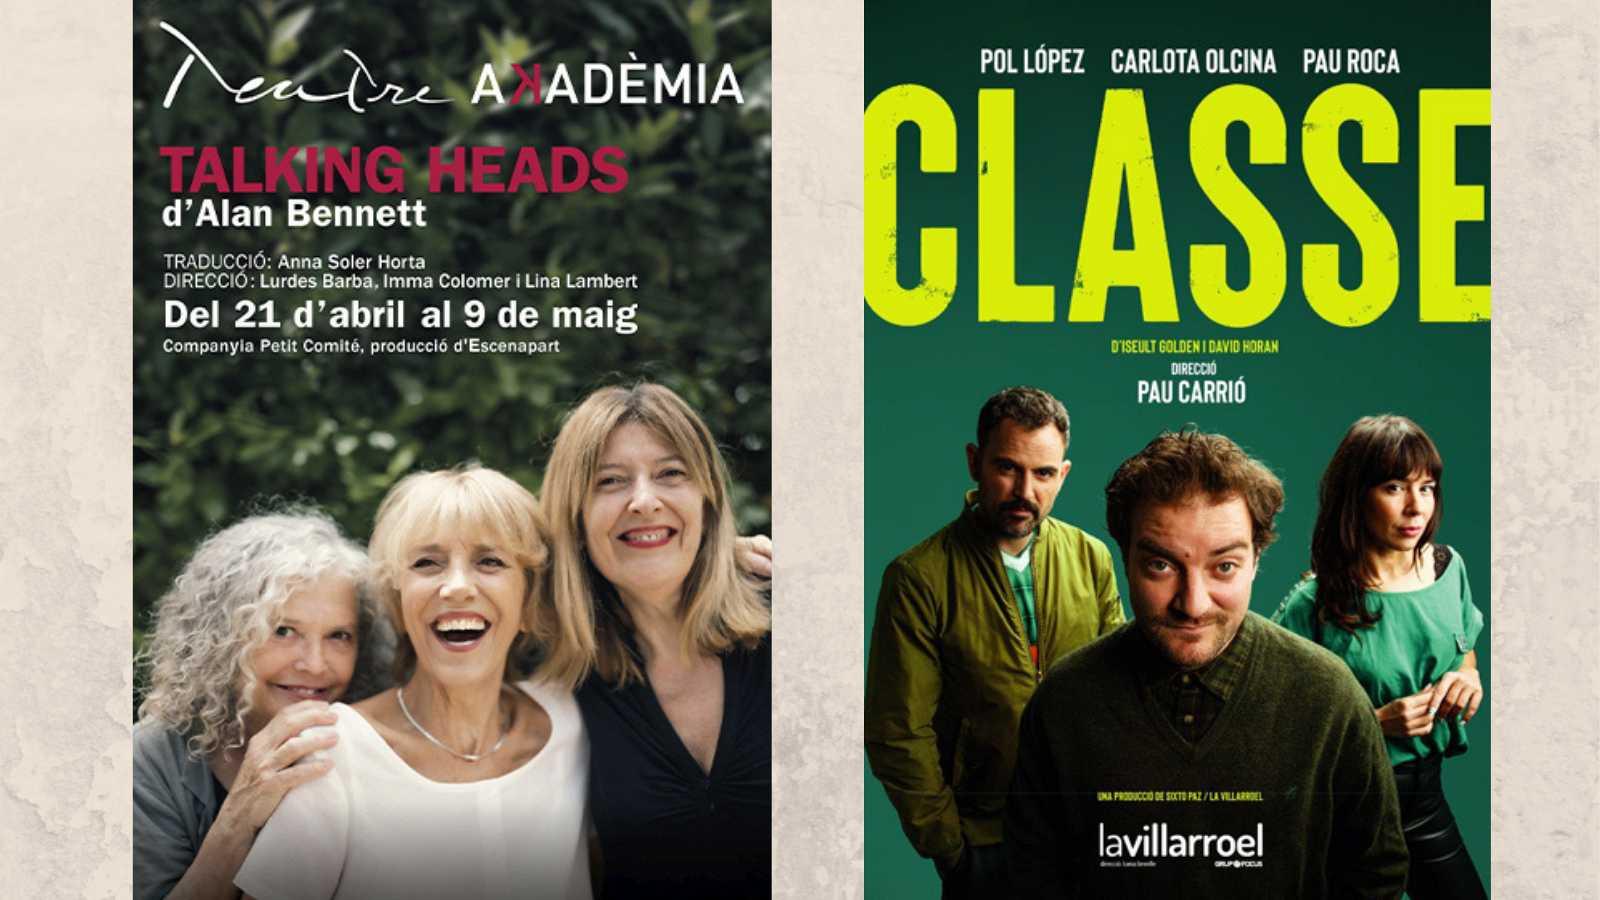 Wonderland - Teatre: 'Talking heads' i 'Classe'